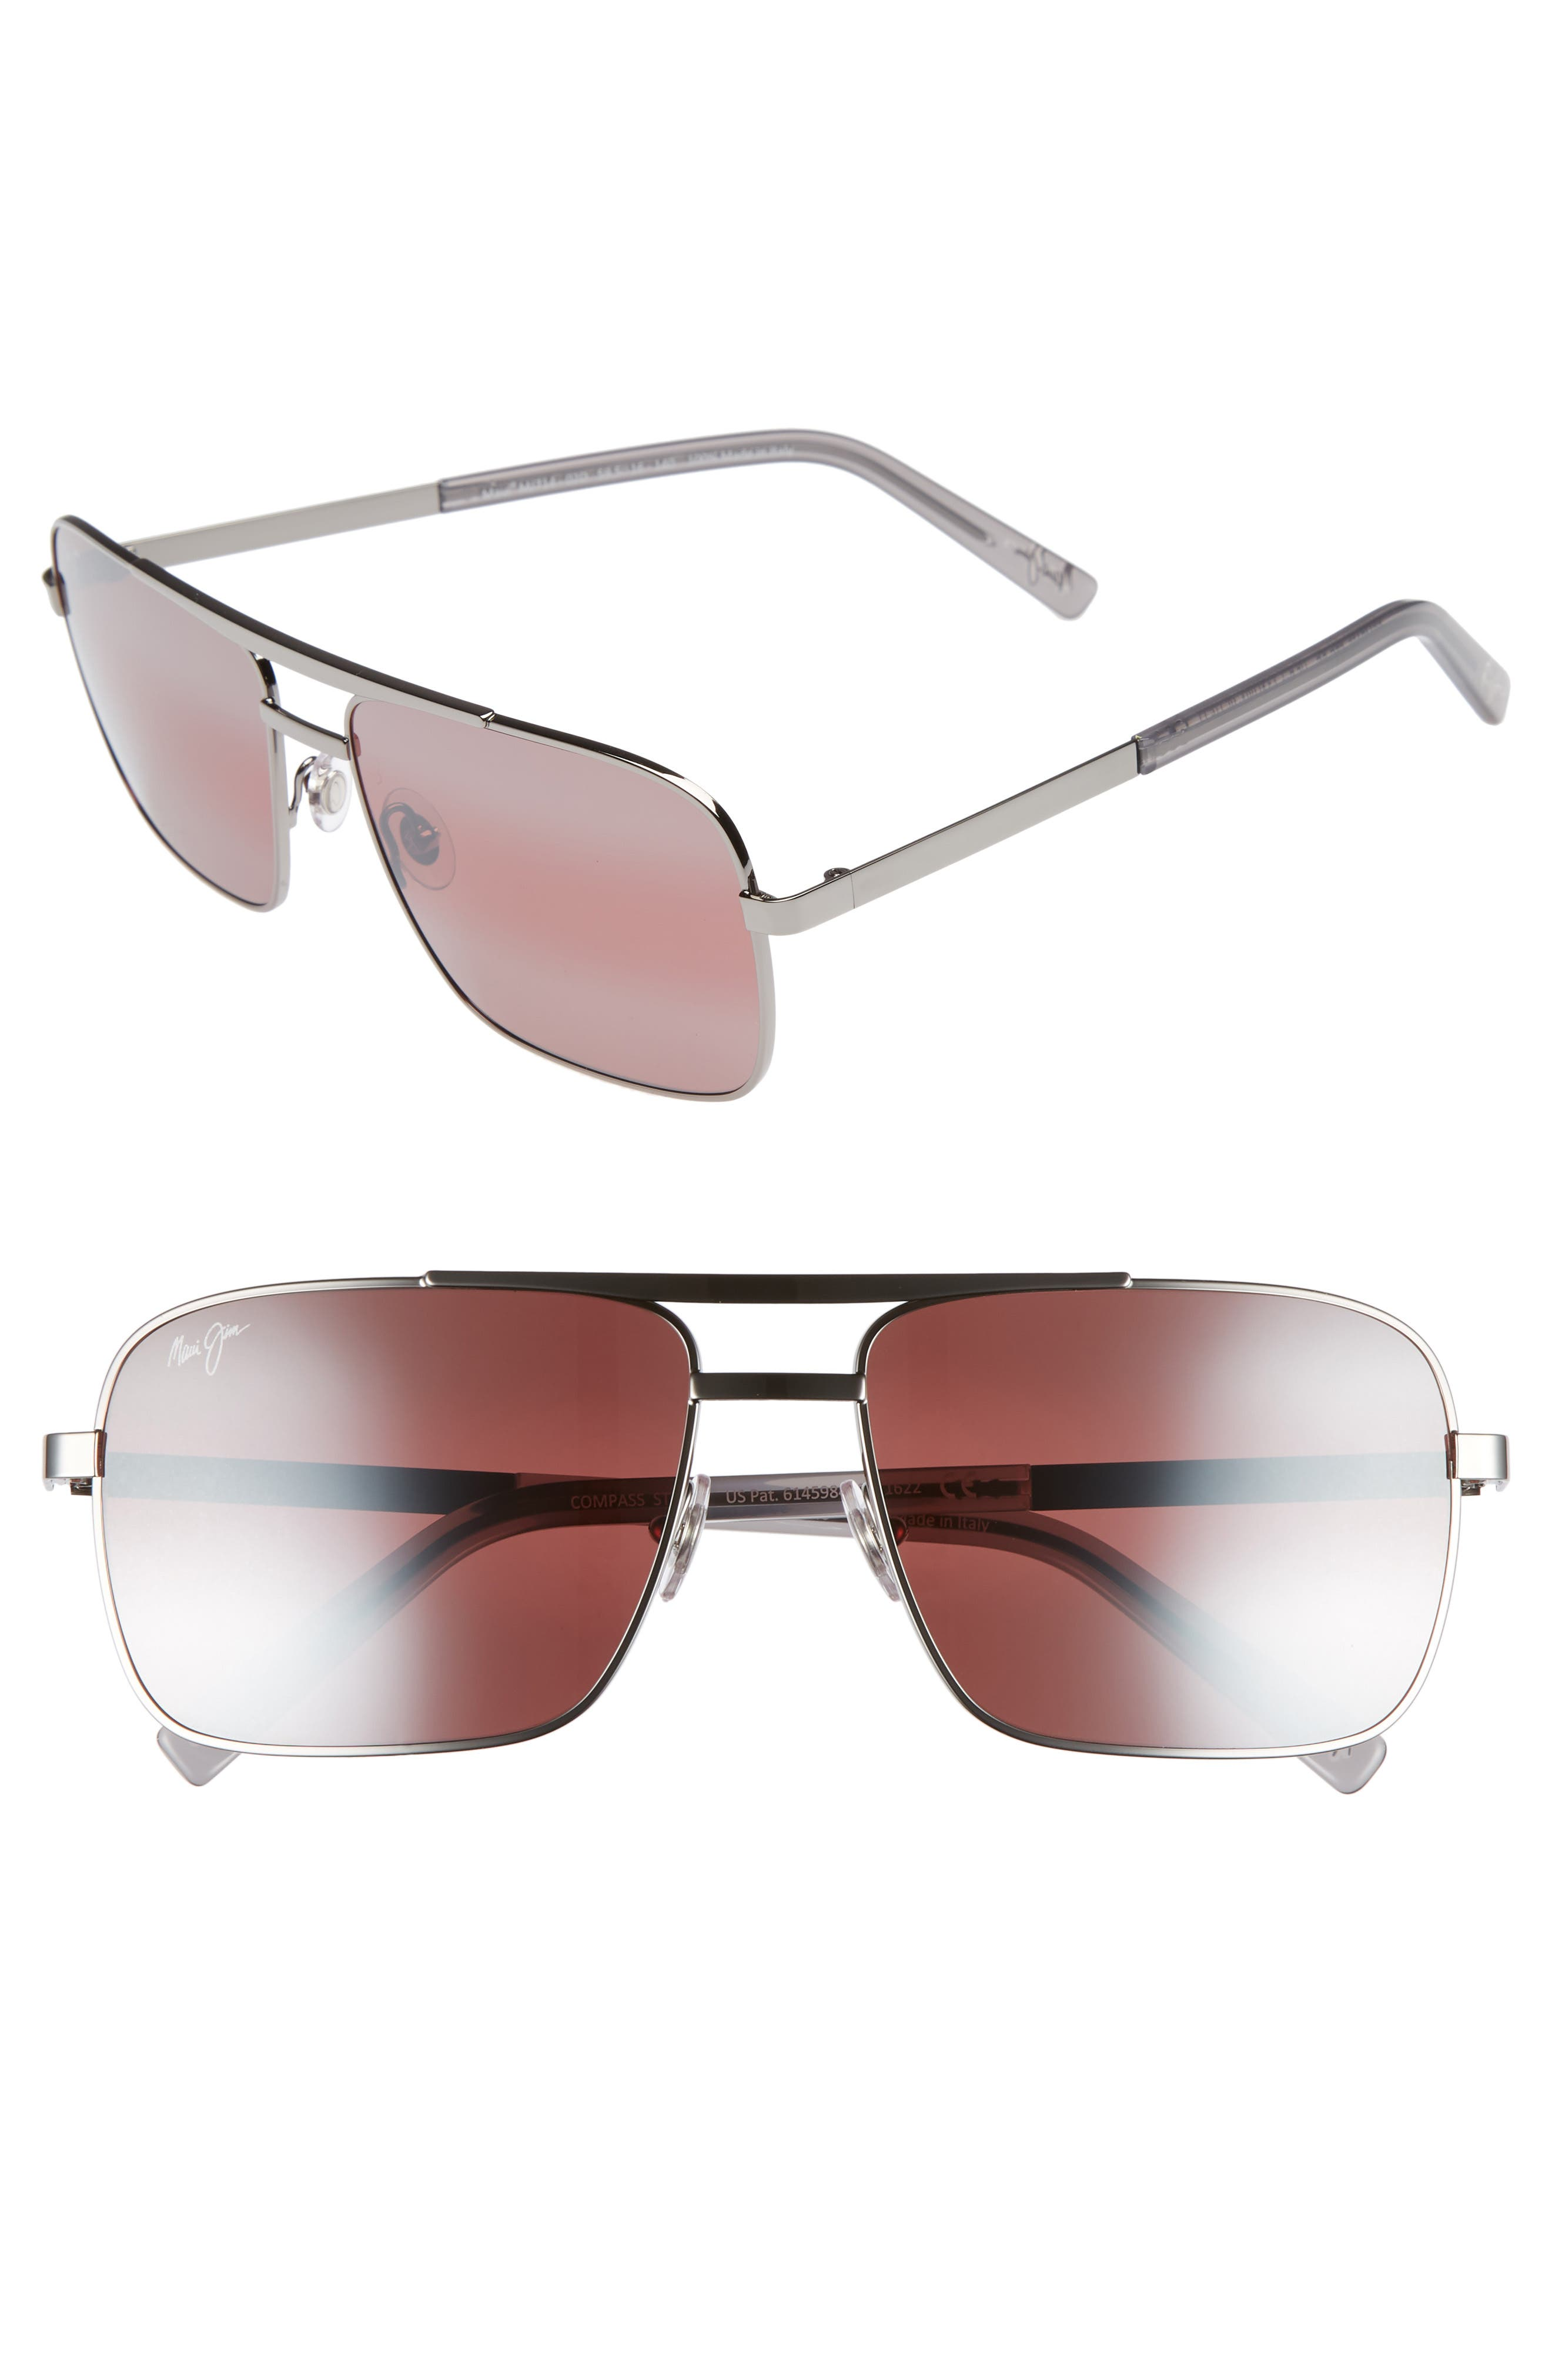 Maui Jim Compass 60Mm Polarized Aviator Sunglasses - Gunmetal/ Maui Rose